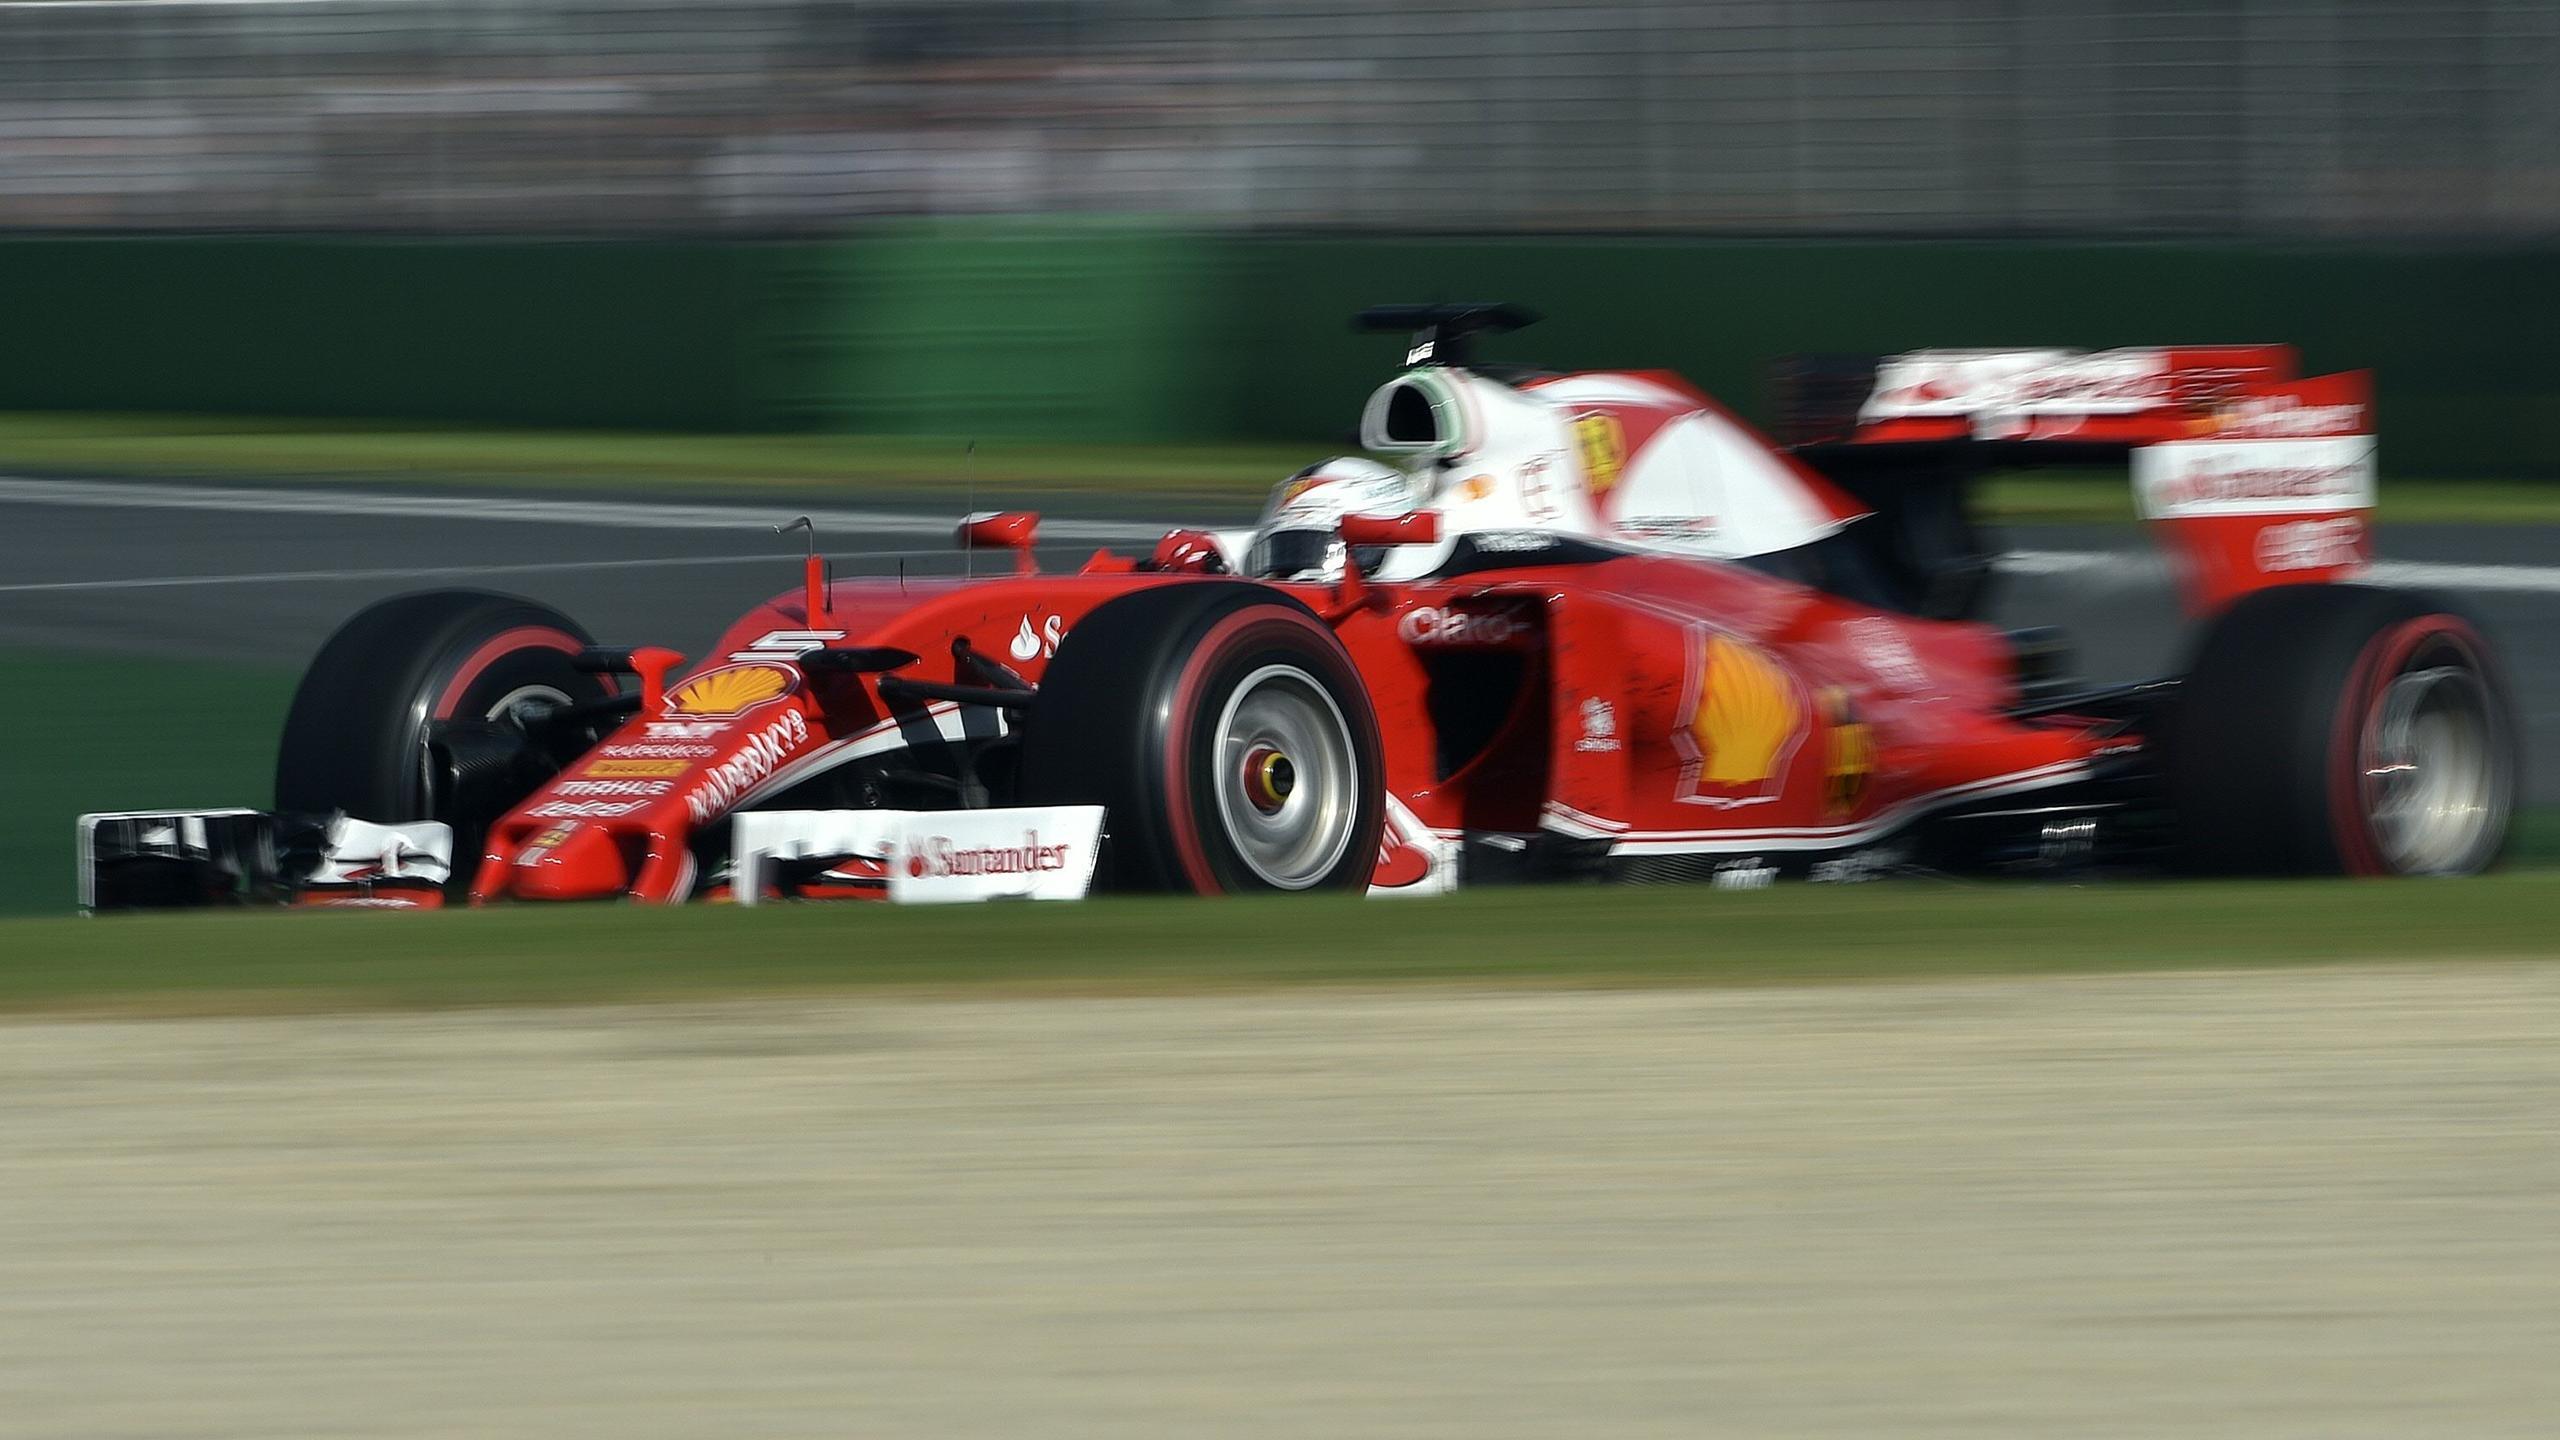 Sebastian Vettel (Ferrari) - GP of Australia 2016